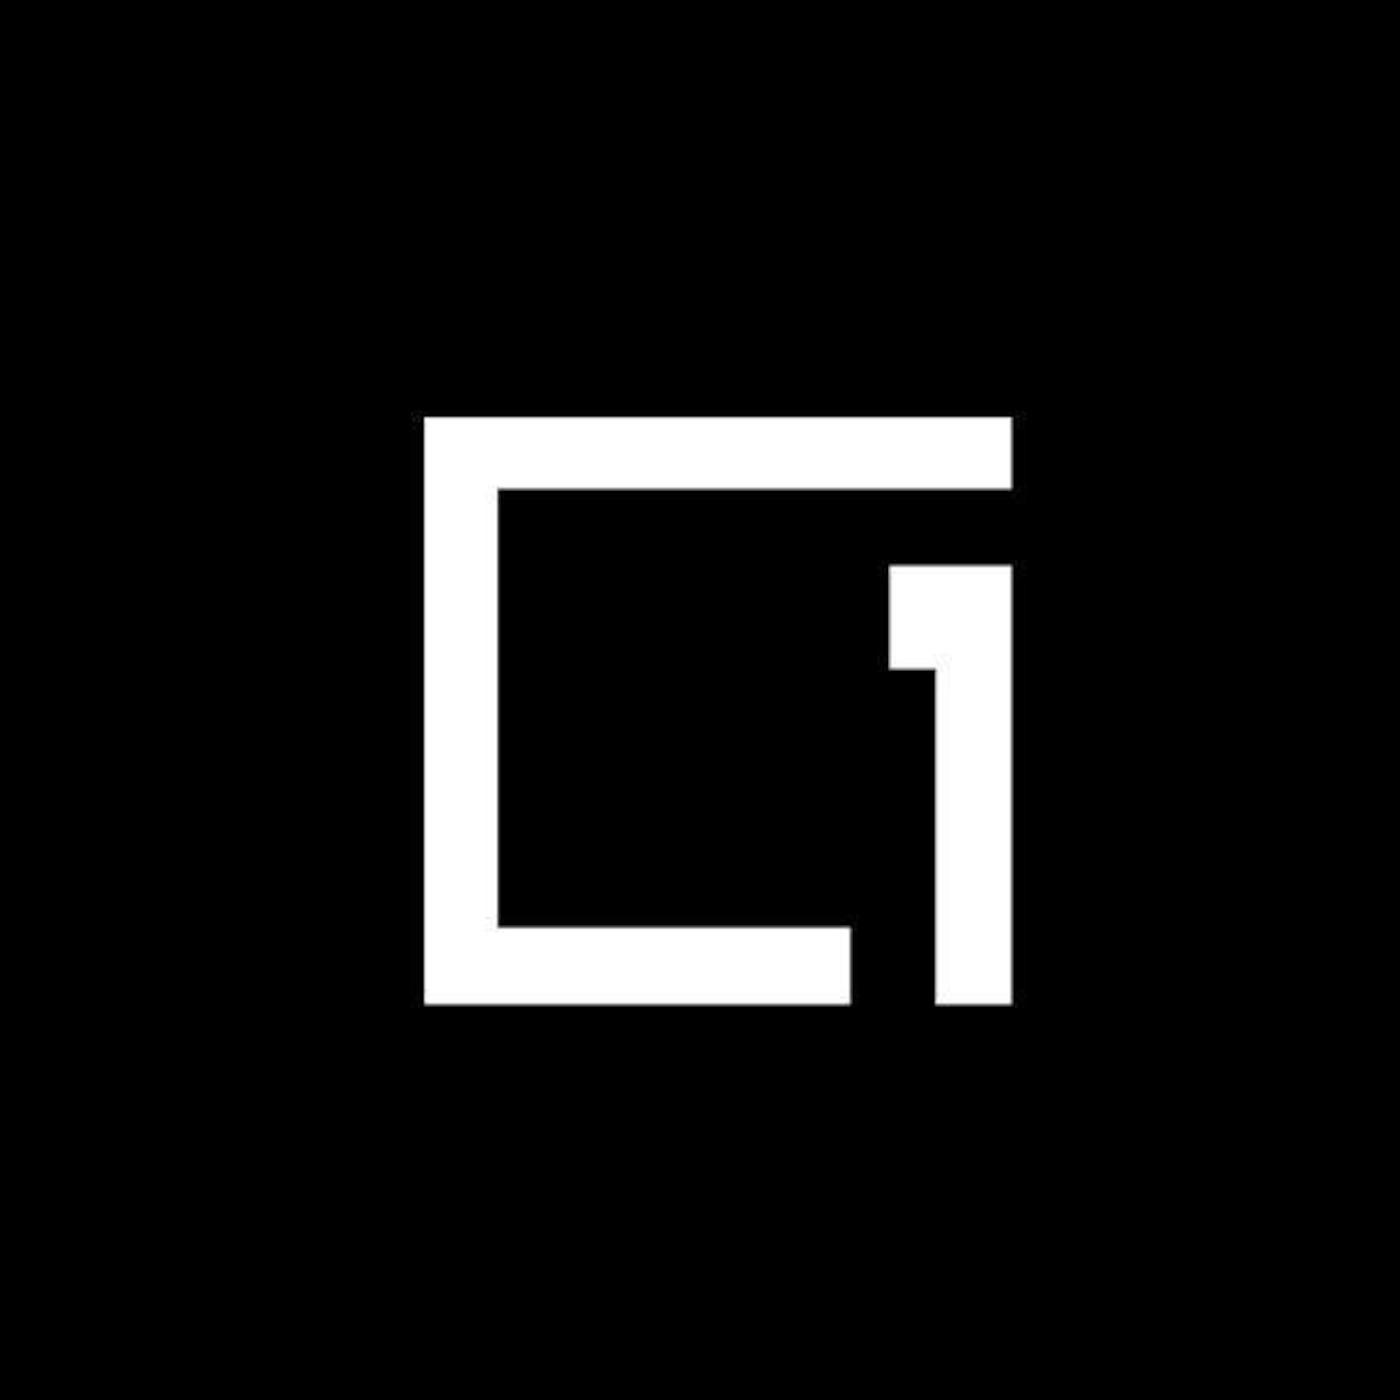 SquareOne Podcast